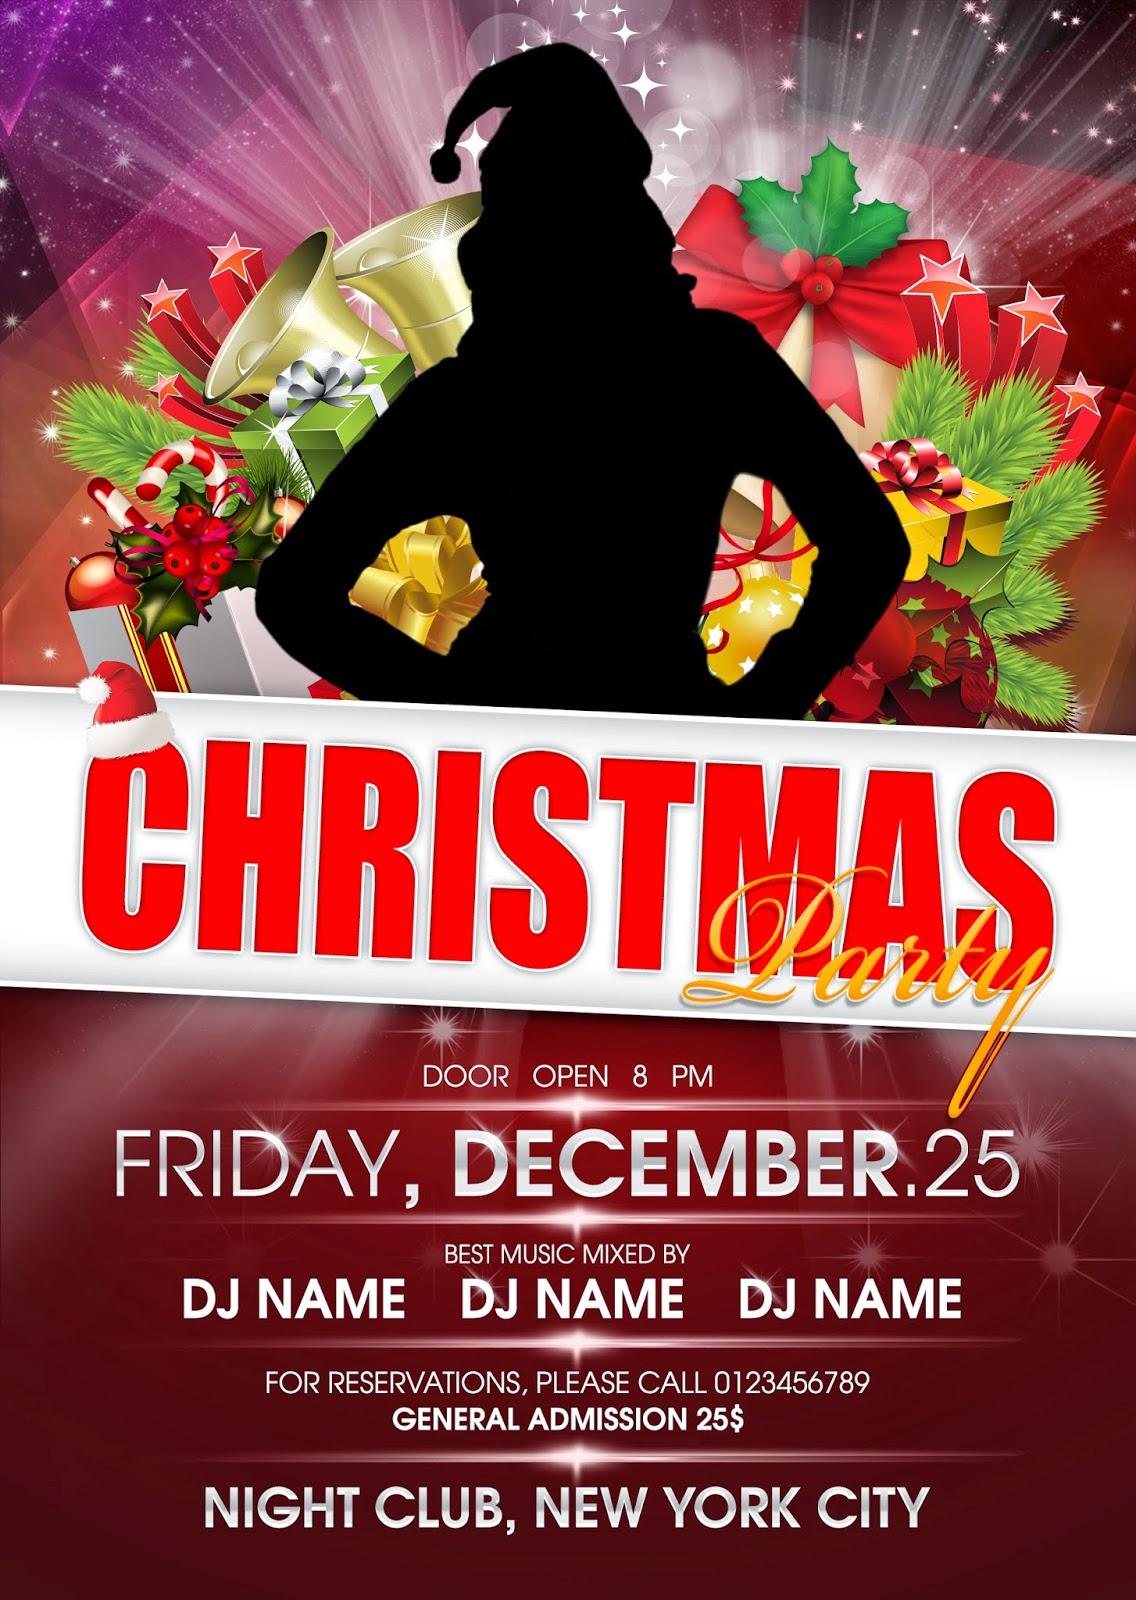 1ideaa christmas party flyer template psd christmas party flyer template psd